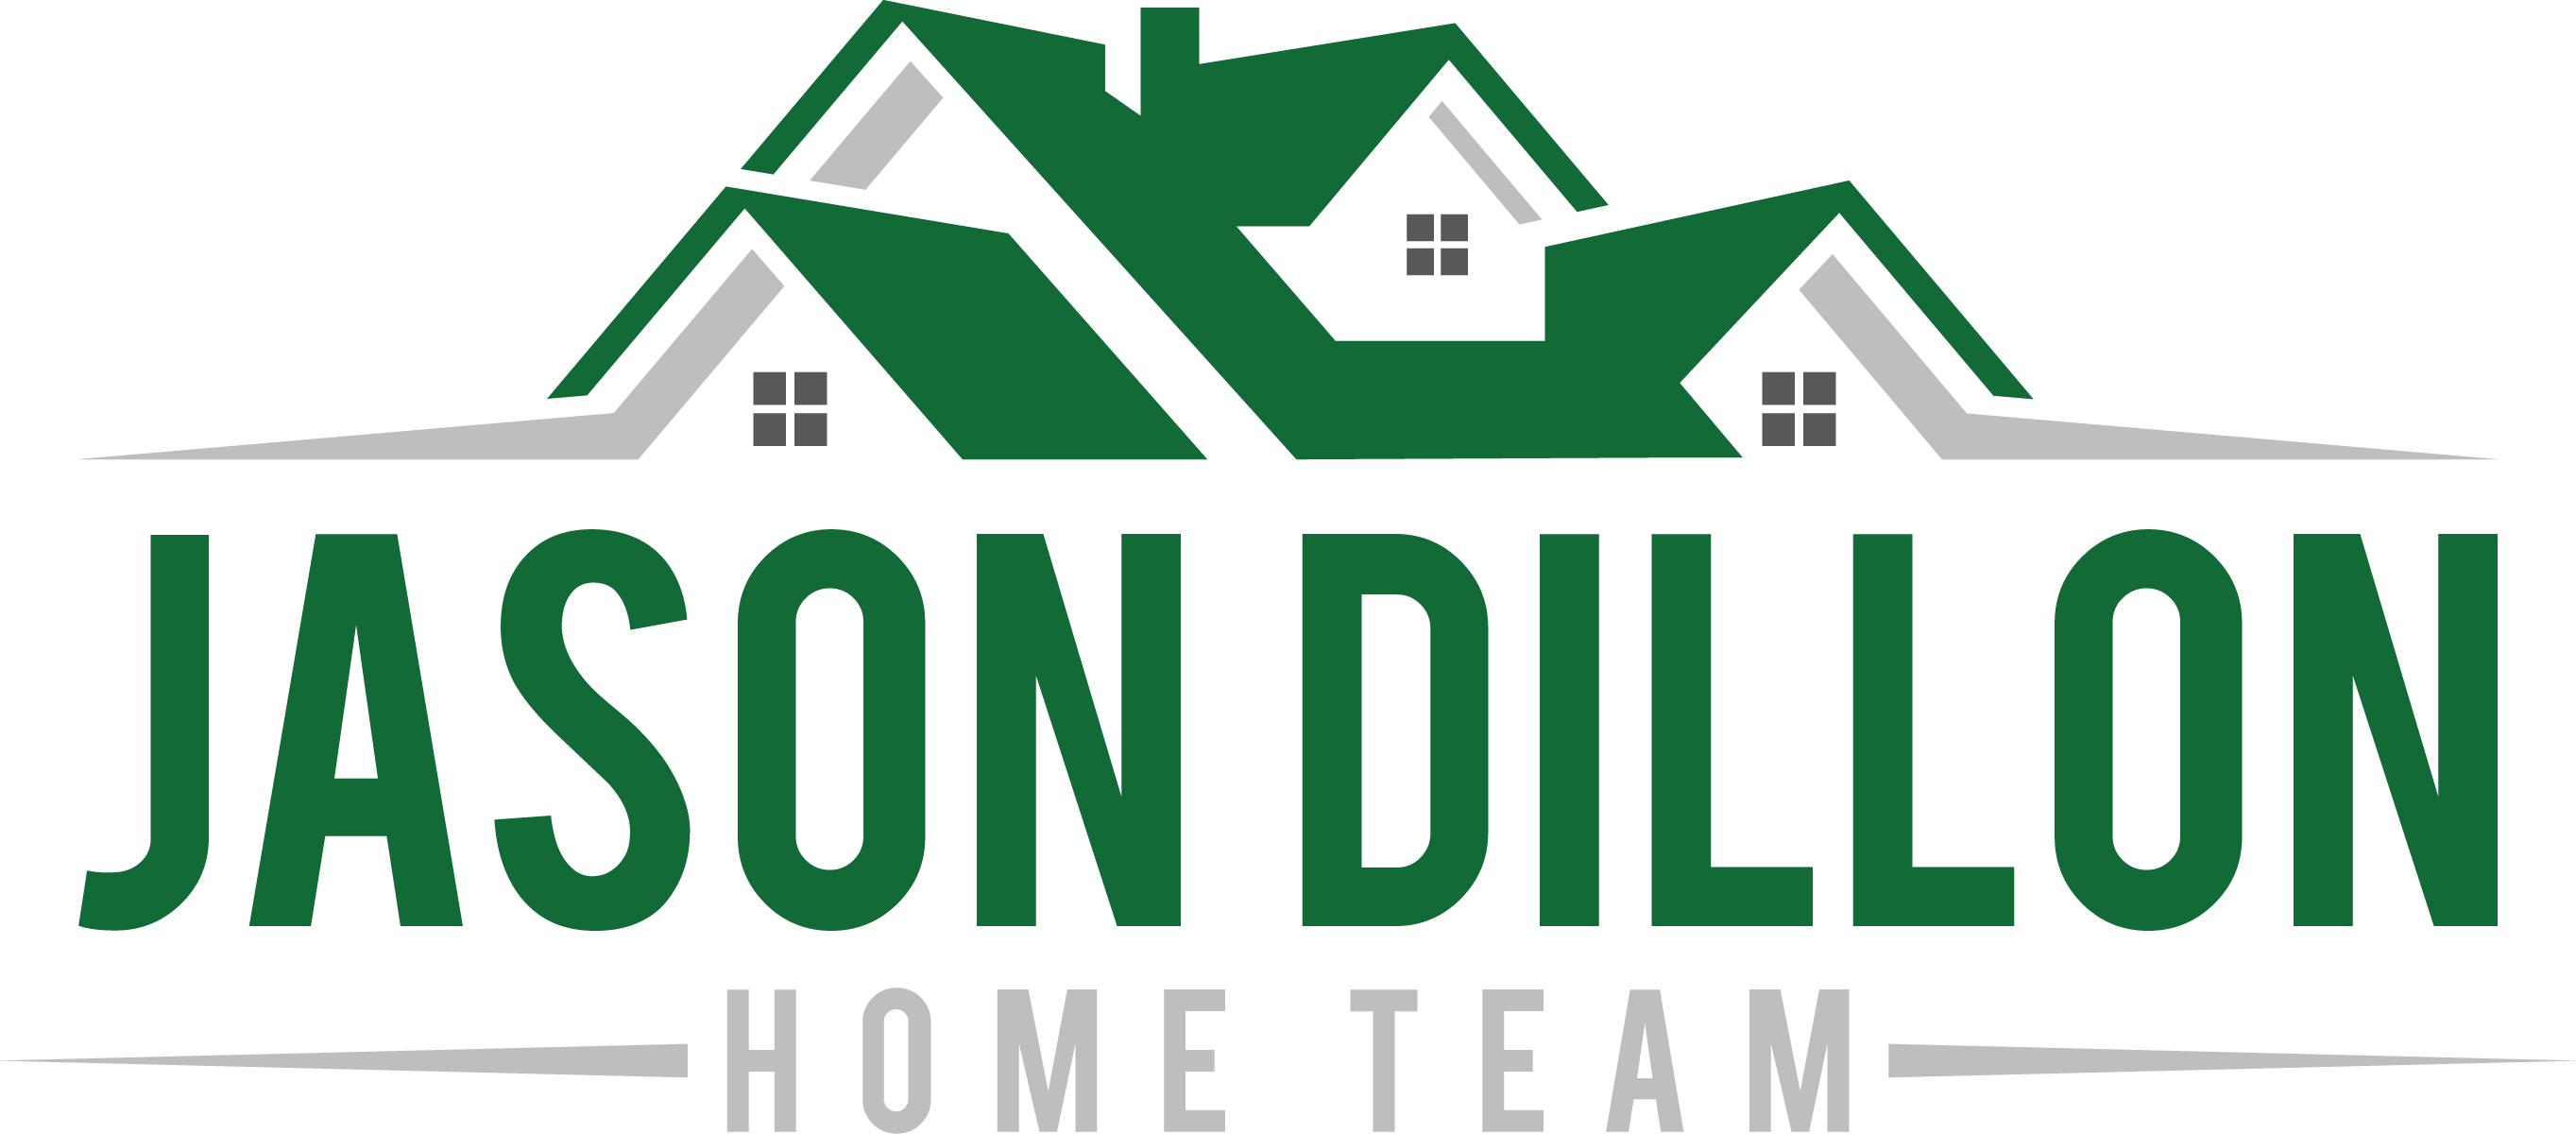 The Jason Dillon Home Team @ Howard Hanna | Rand Realty logo